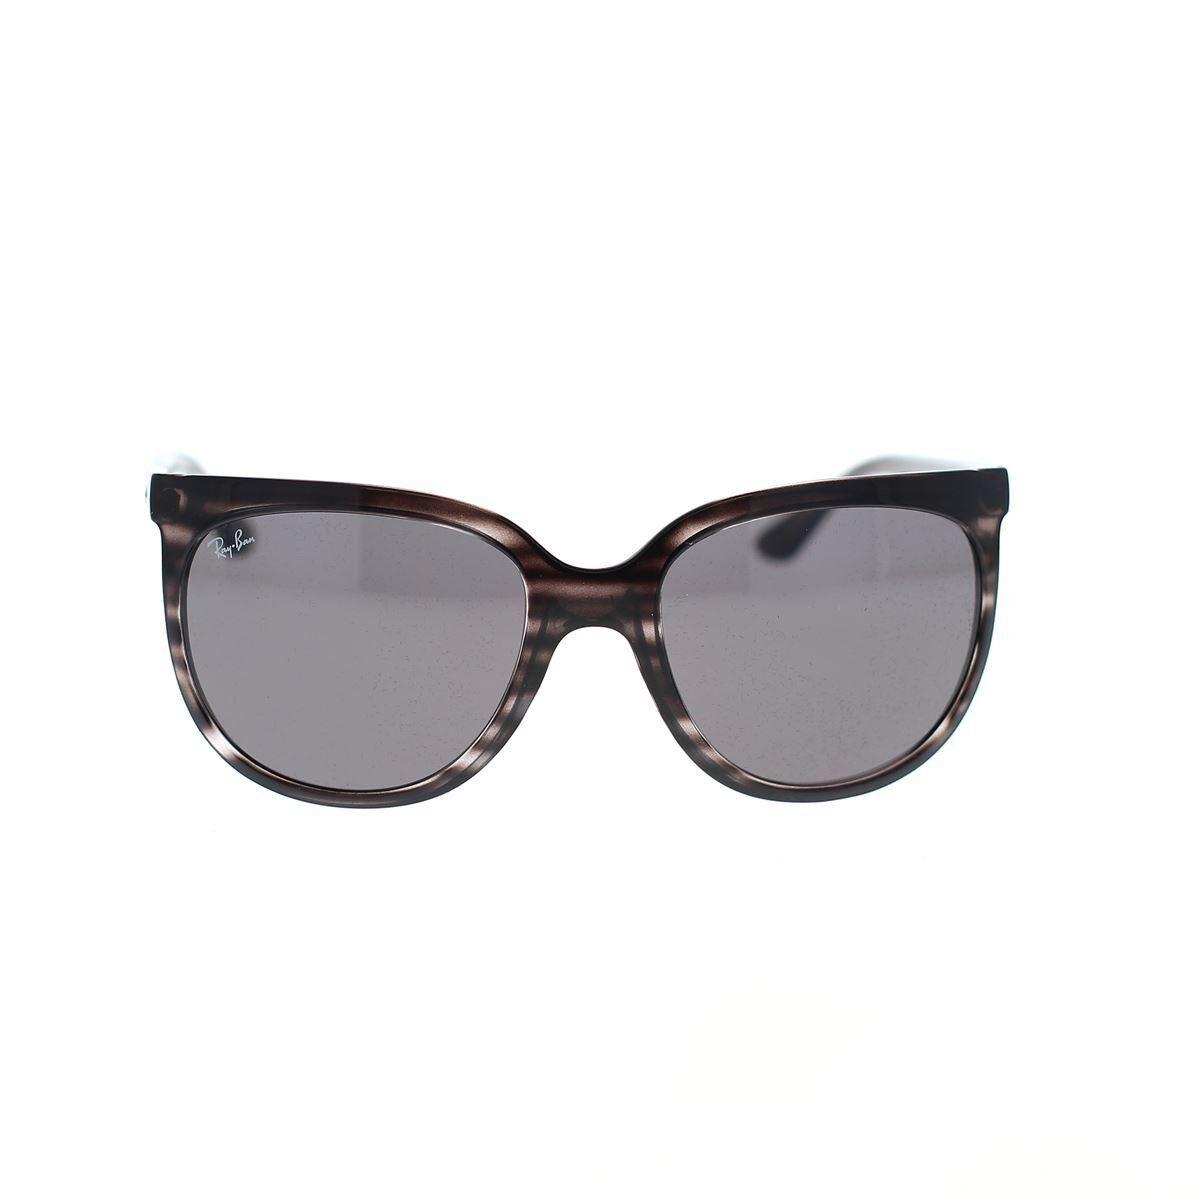 ray-ban occhiali da sole cats 1000 rb4126 6430b1